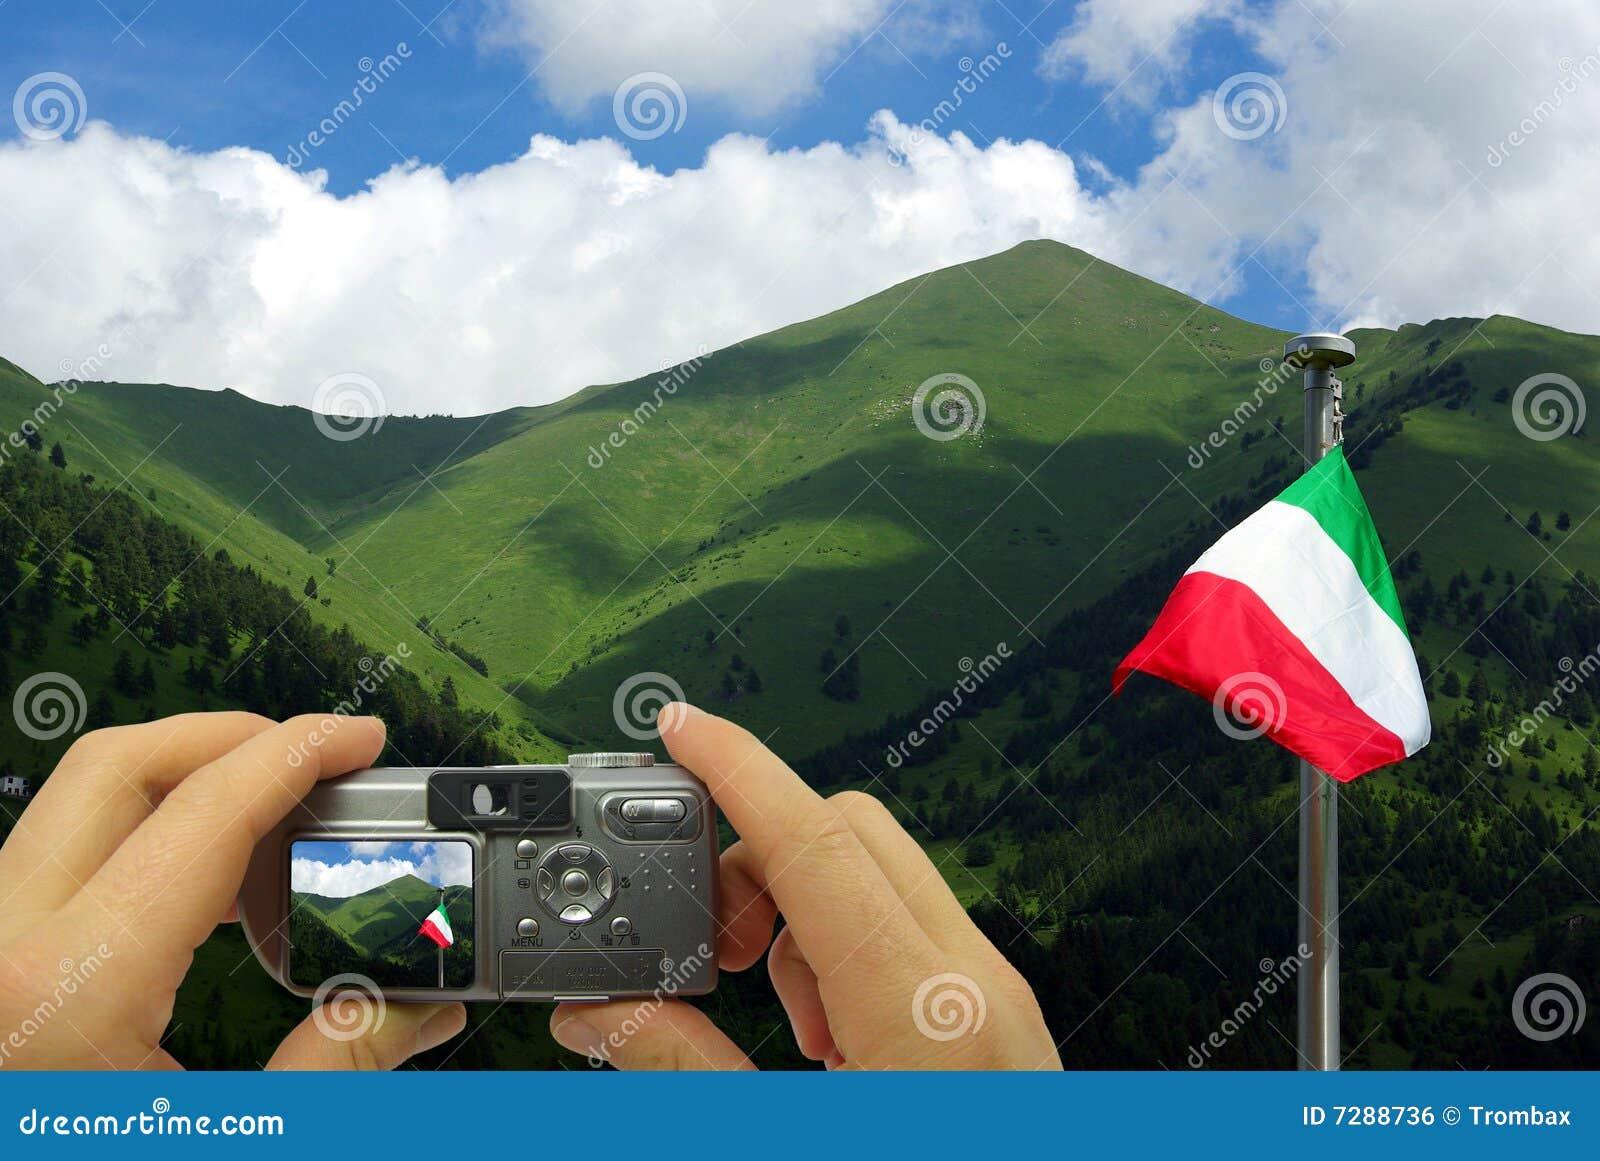 Paisaje del italiano de los montajes de la foto